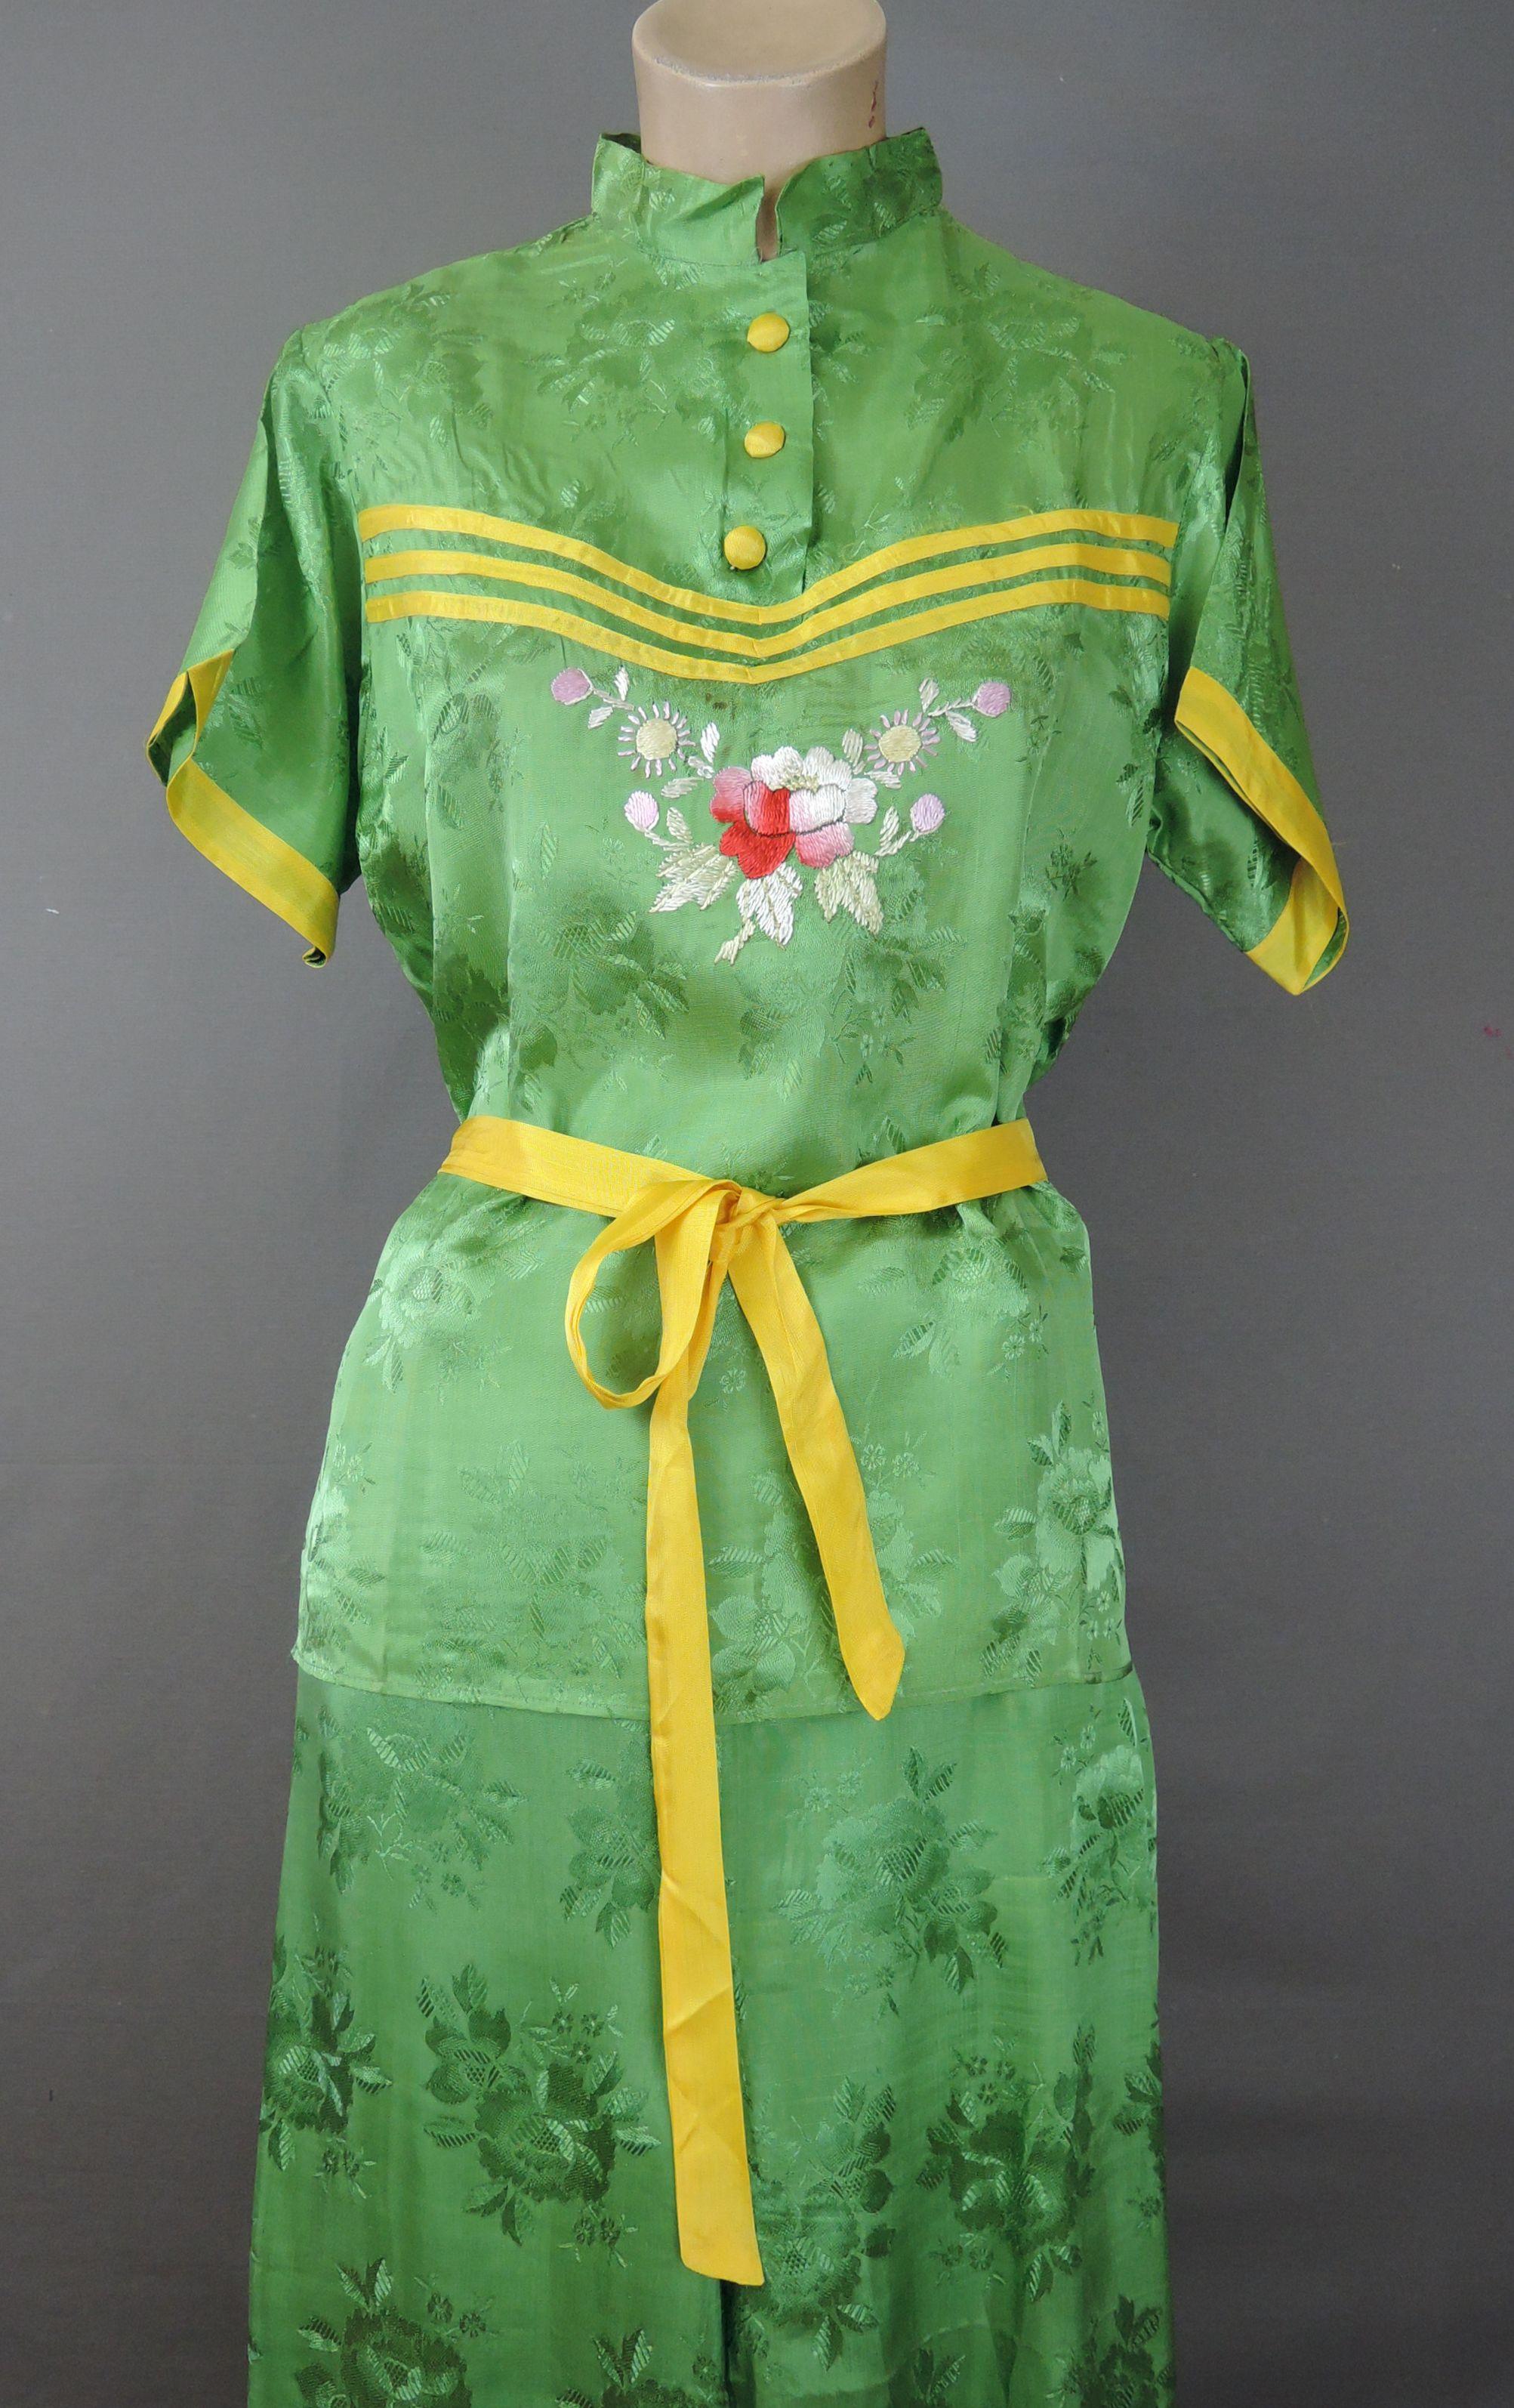 Vintage 1940s Embroidered Pajamas, Wide Legged Rayon, 38 bust